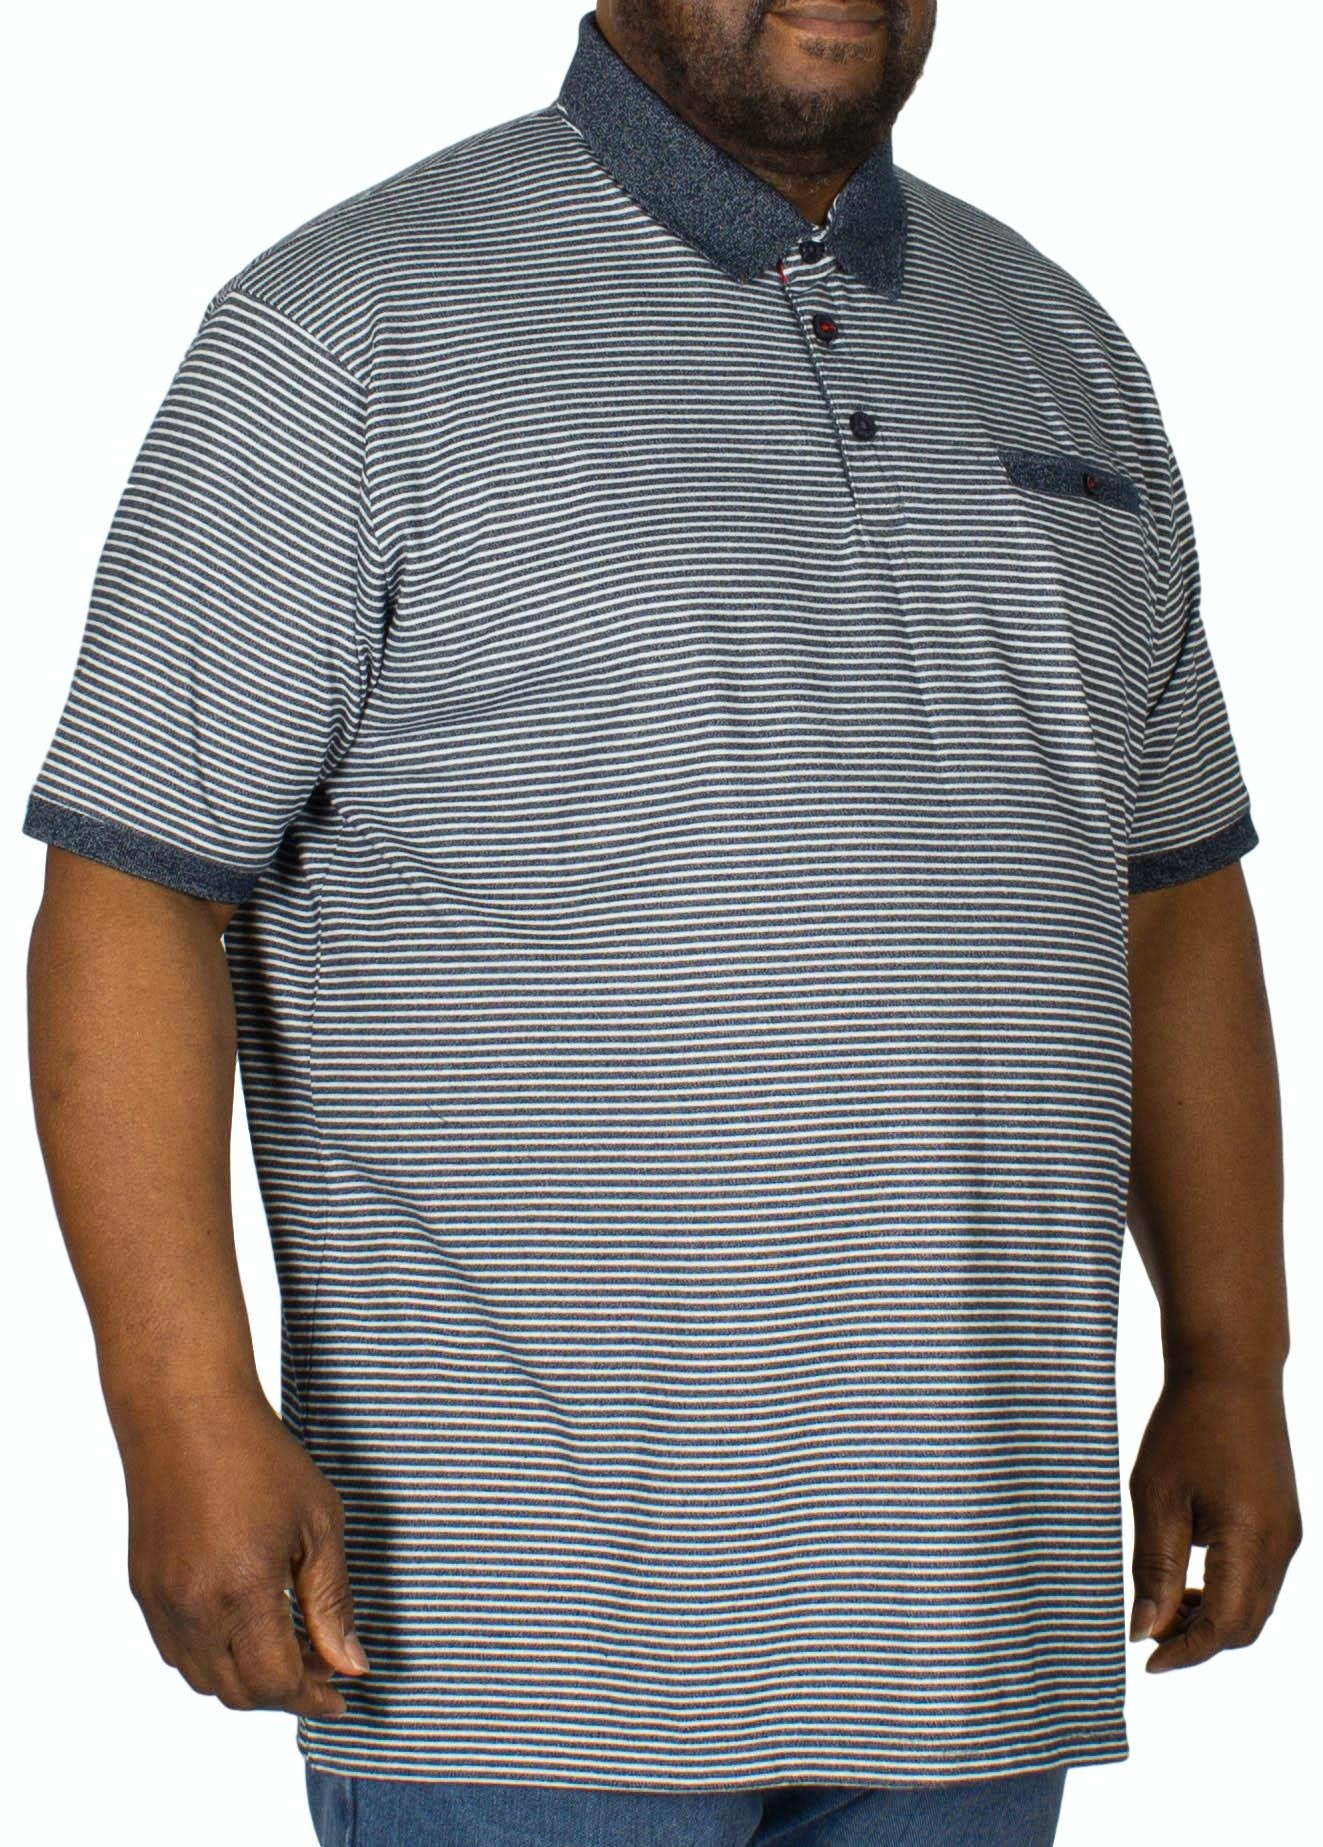 D555 Tyrone Stripe Polo Shirt Denim